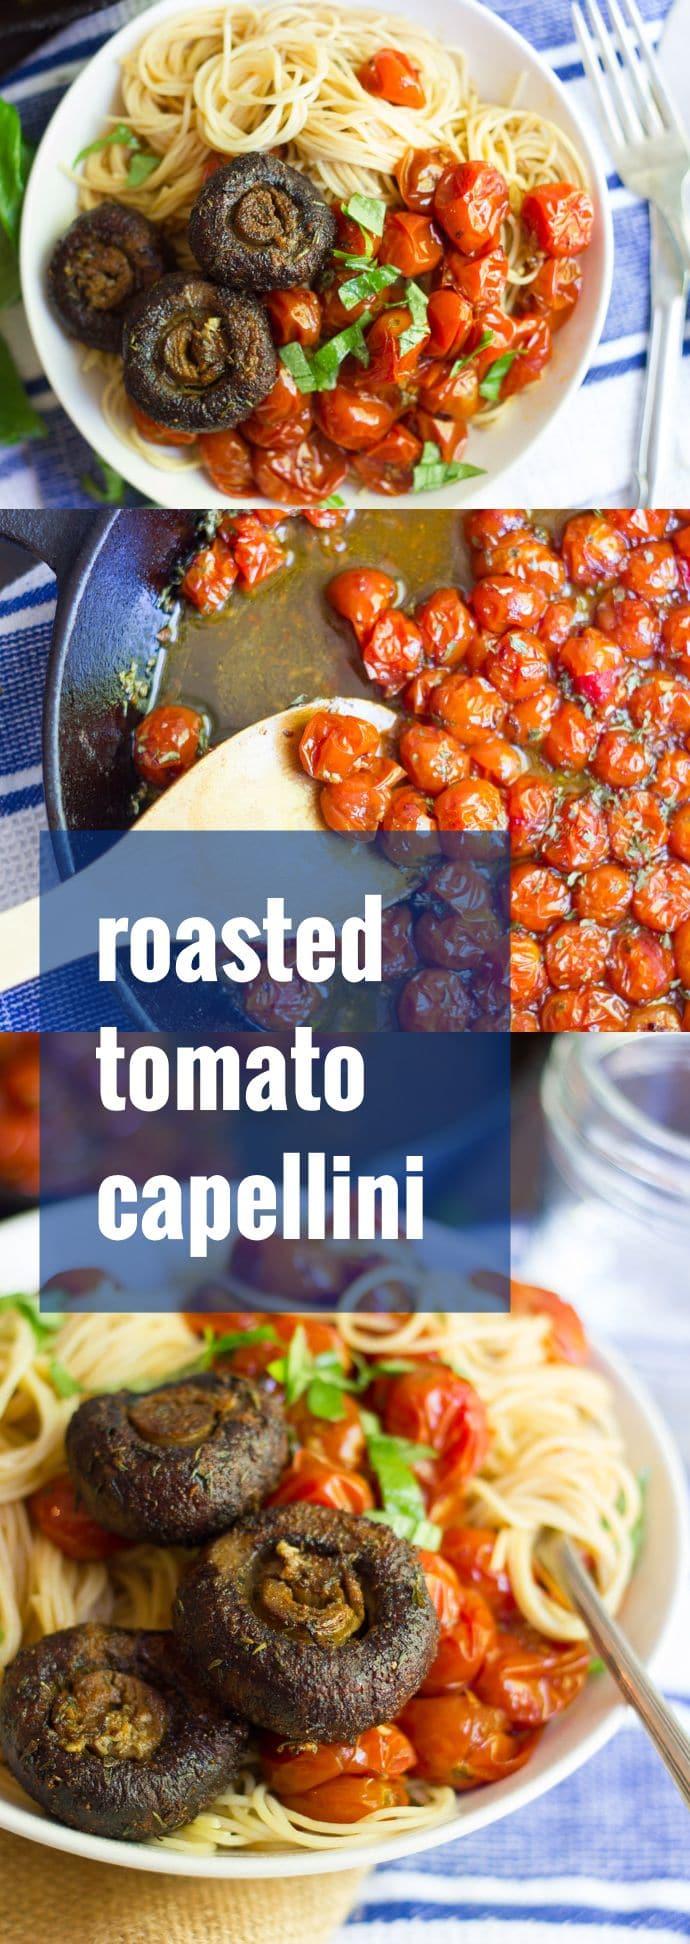 Capellini with Spicy Cherry Tomato Sauce & Blackened Mushrooms